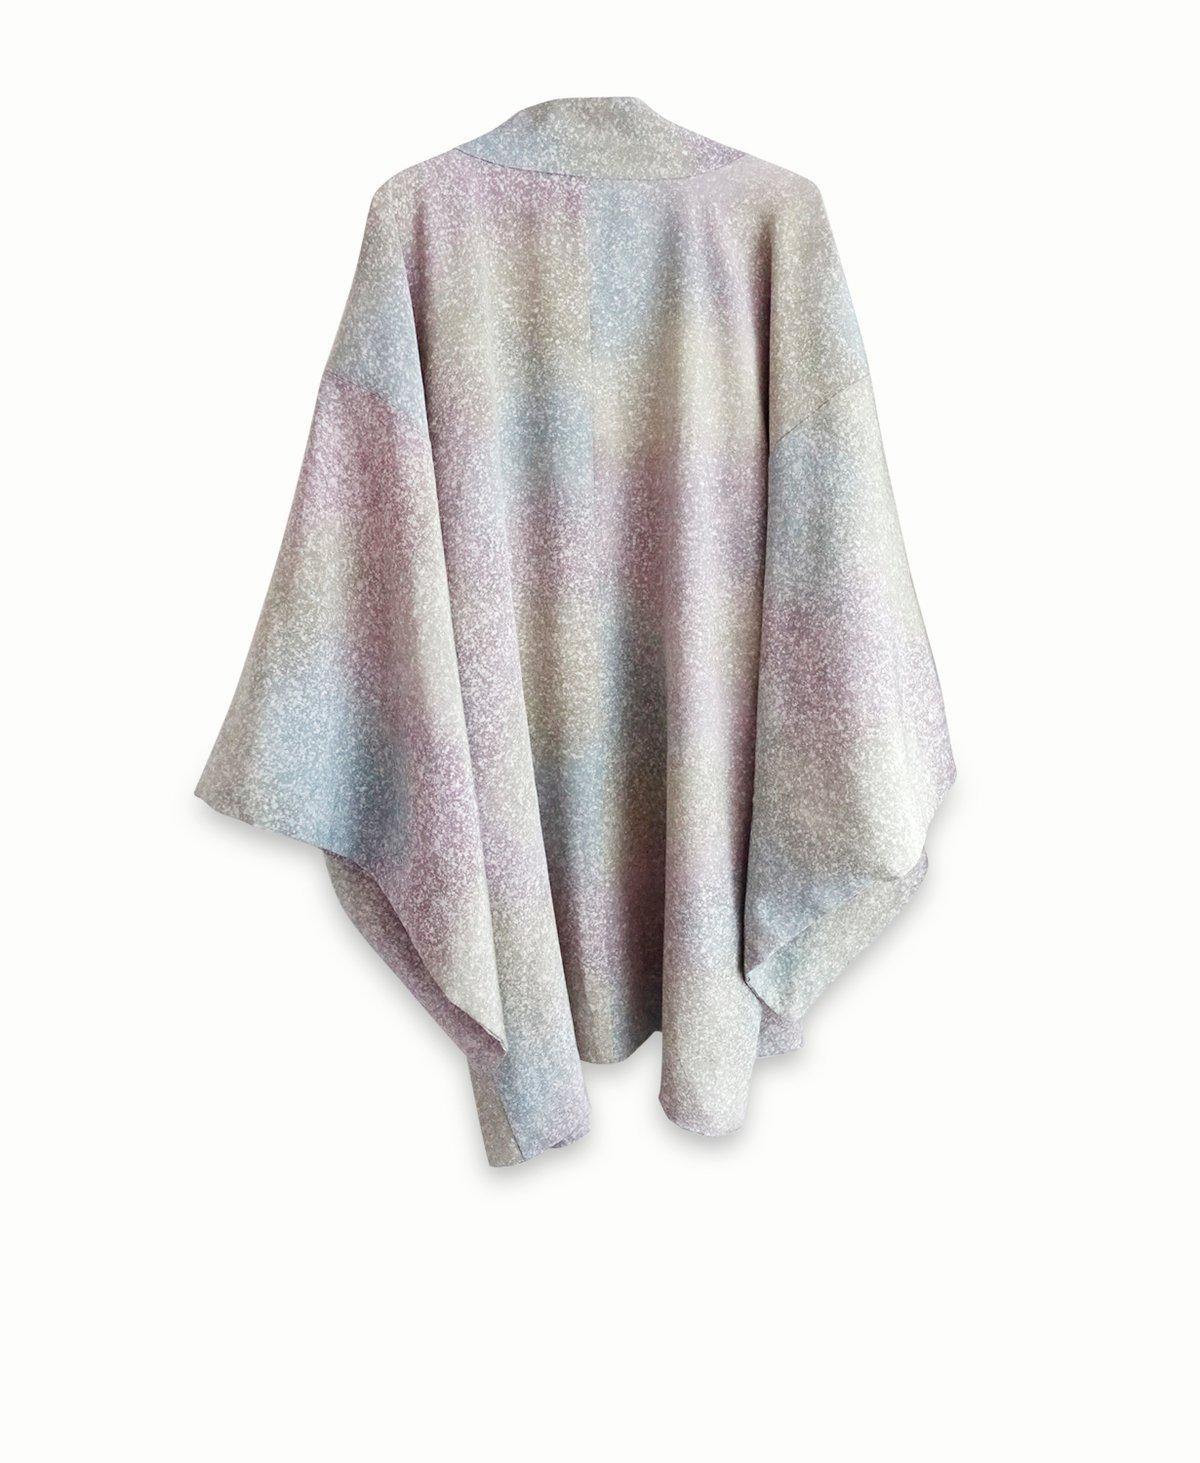 Image of kort kimono - grålige pastelfarver med prikmønster / 'Too Fairy'